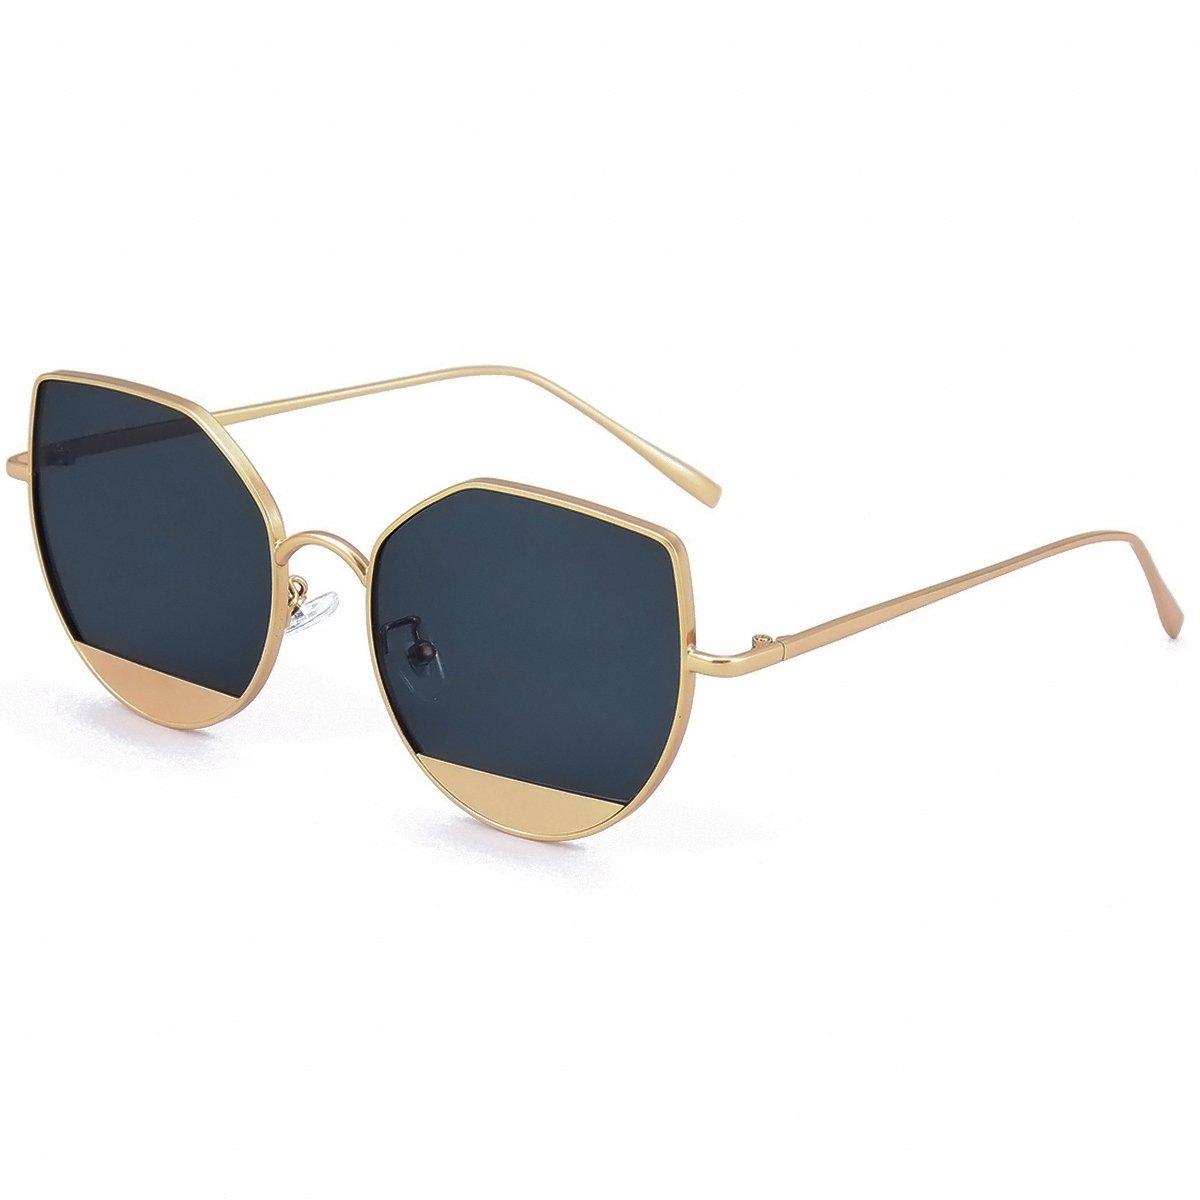 WISH CLUB Cat Eye Sunglasses Coating Mirrored Flat Lenses Fashion Metal Frame Women UV 400(Black)